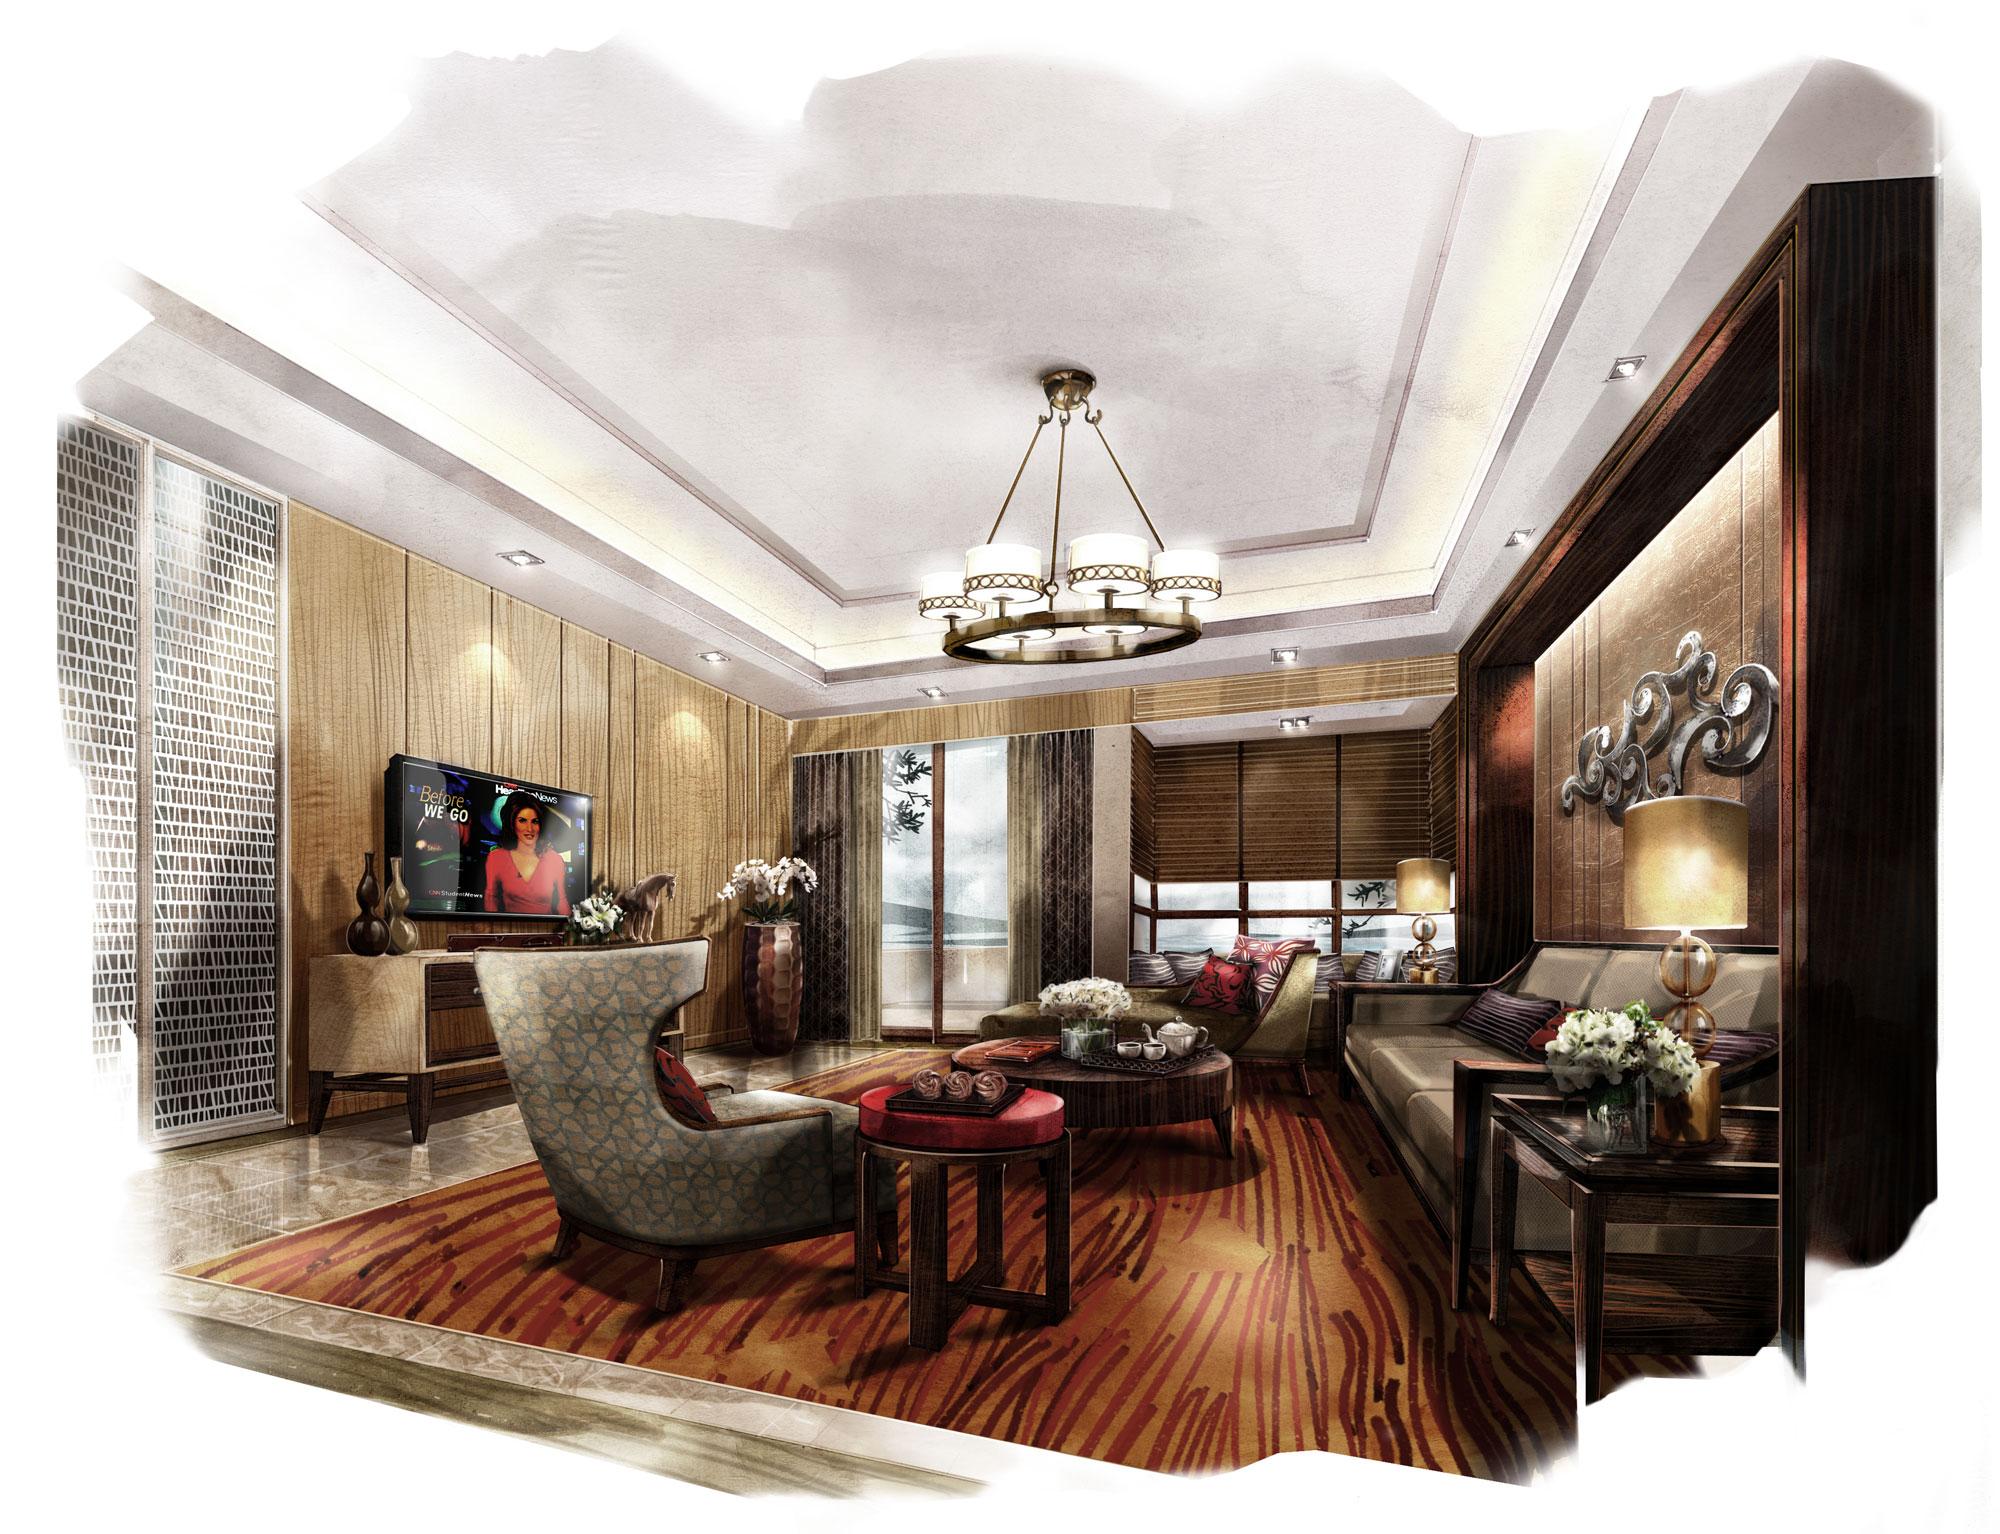 conceptview_interior_kabete_1.jpg